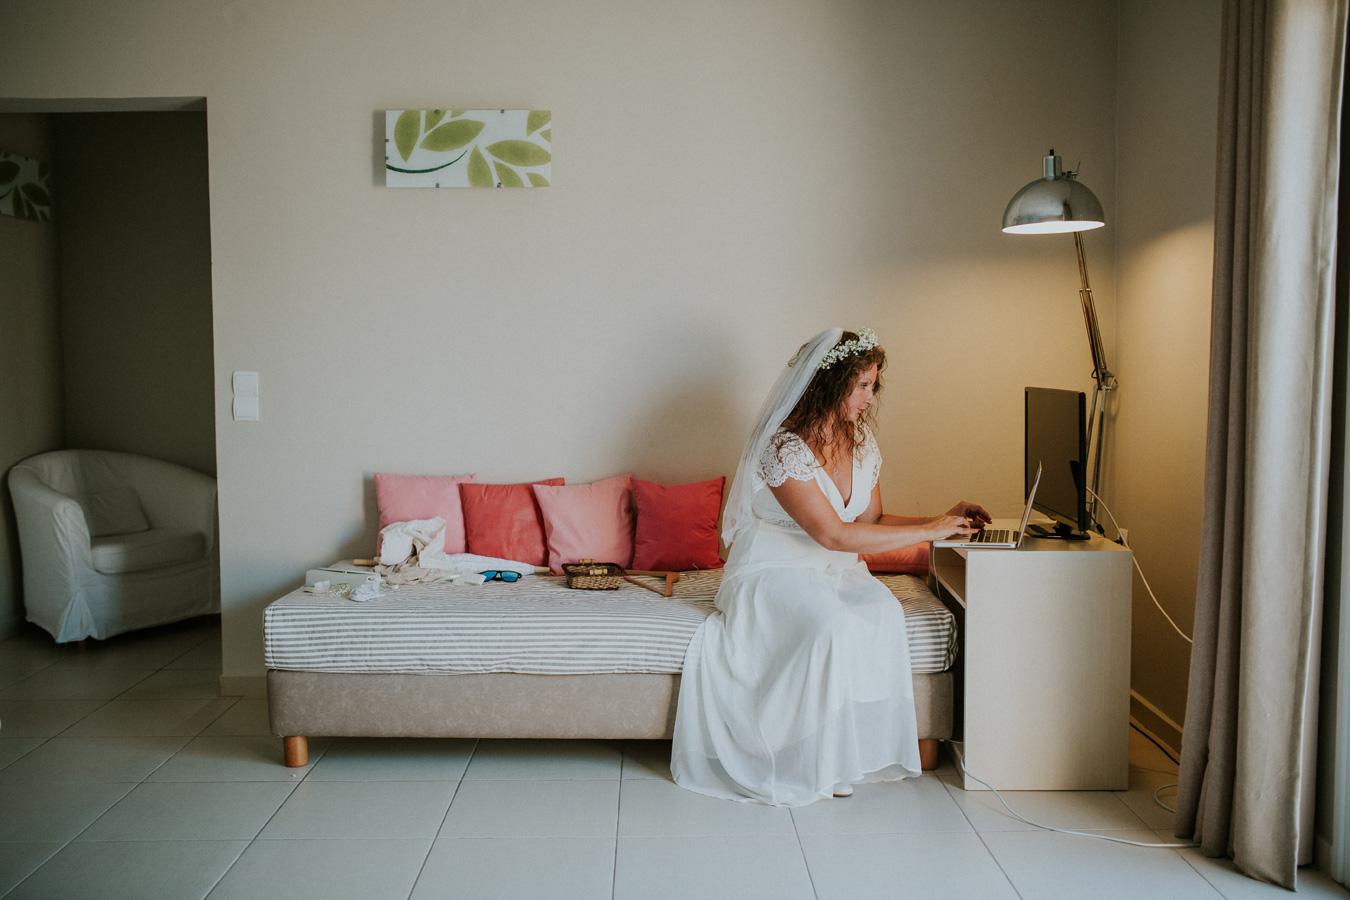 044-bryllupsfotograf-oslo-destinasjonsbryllup-fotograf-tone-tvedt.jpg